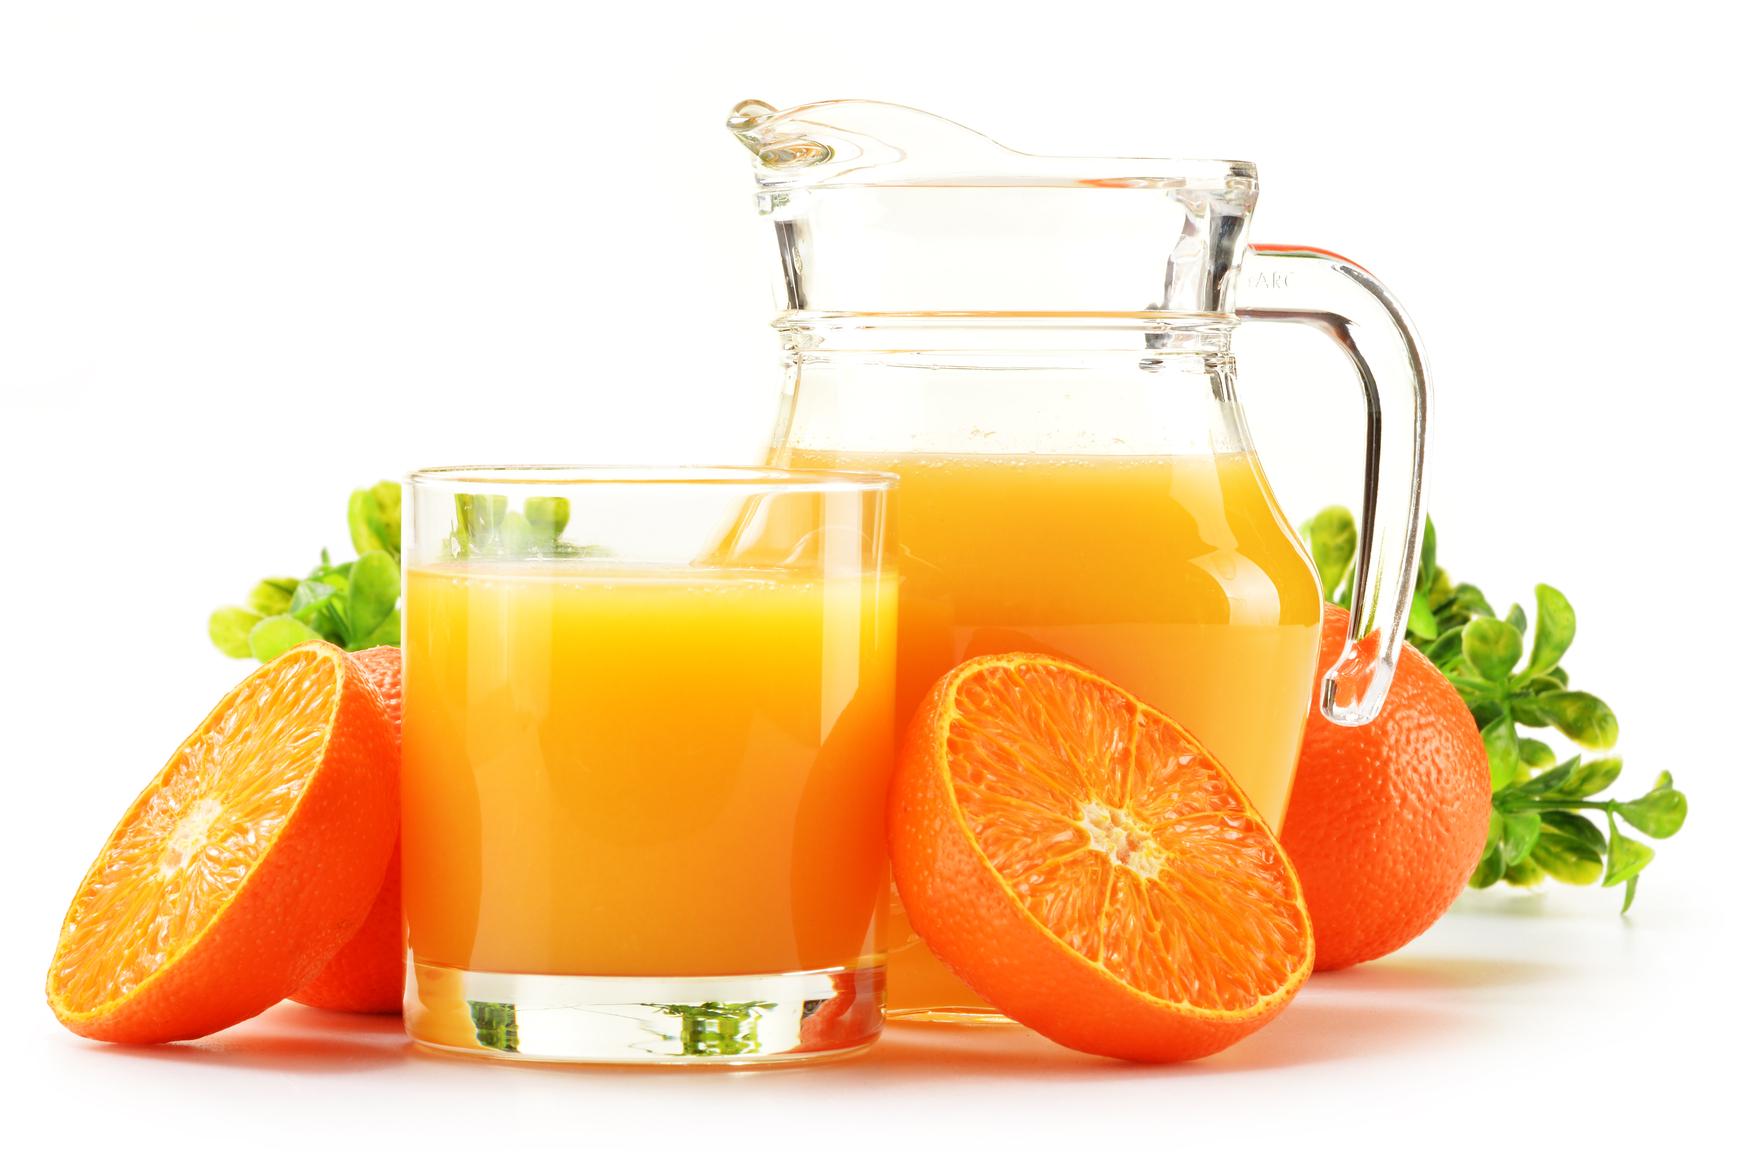 Tomar vitamina c para adelgazar